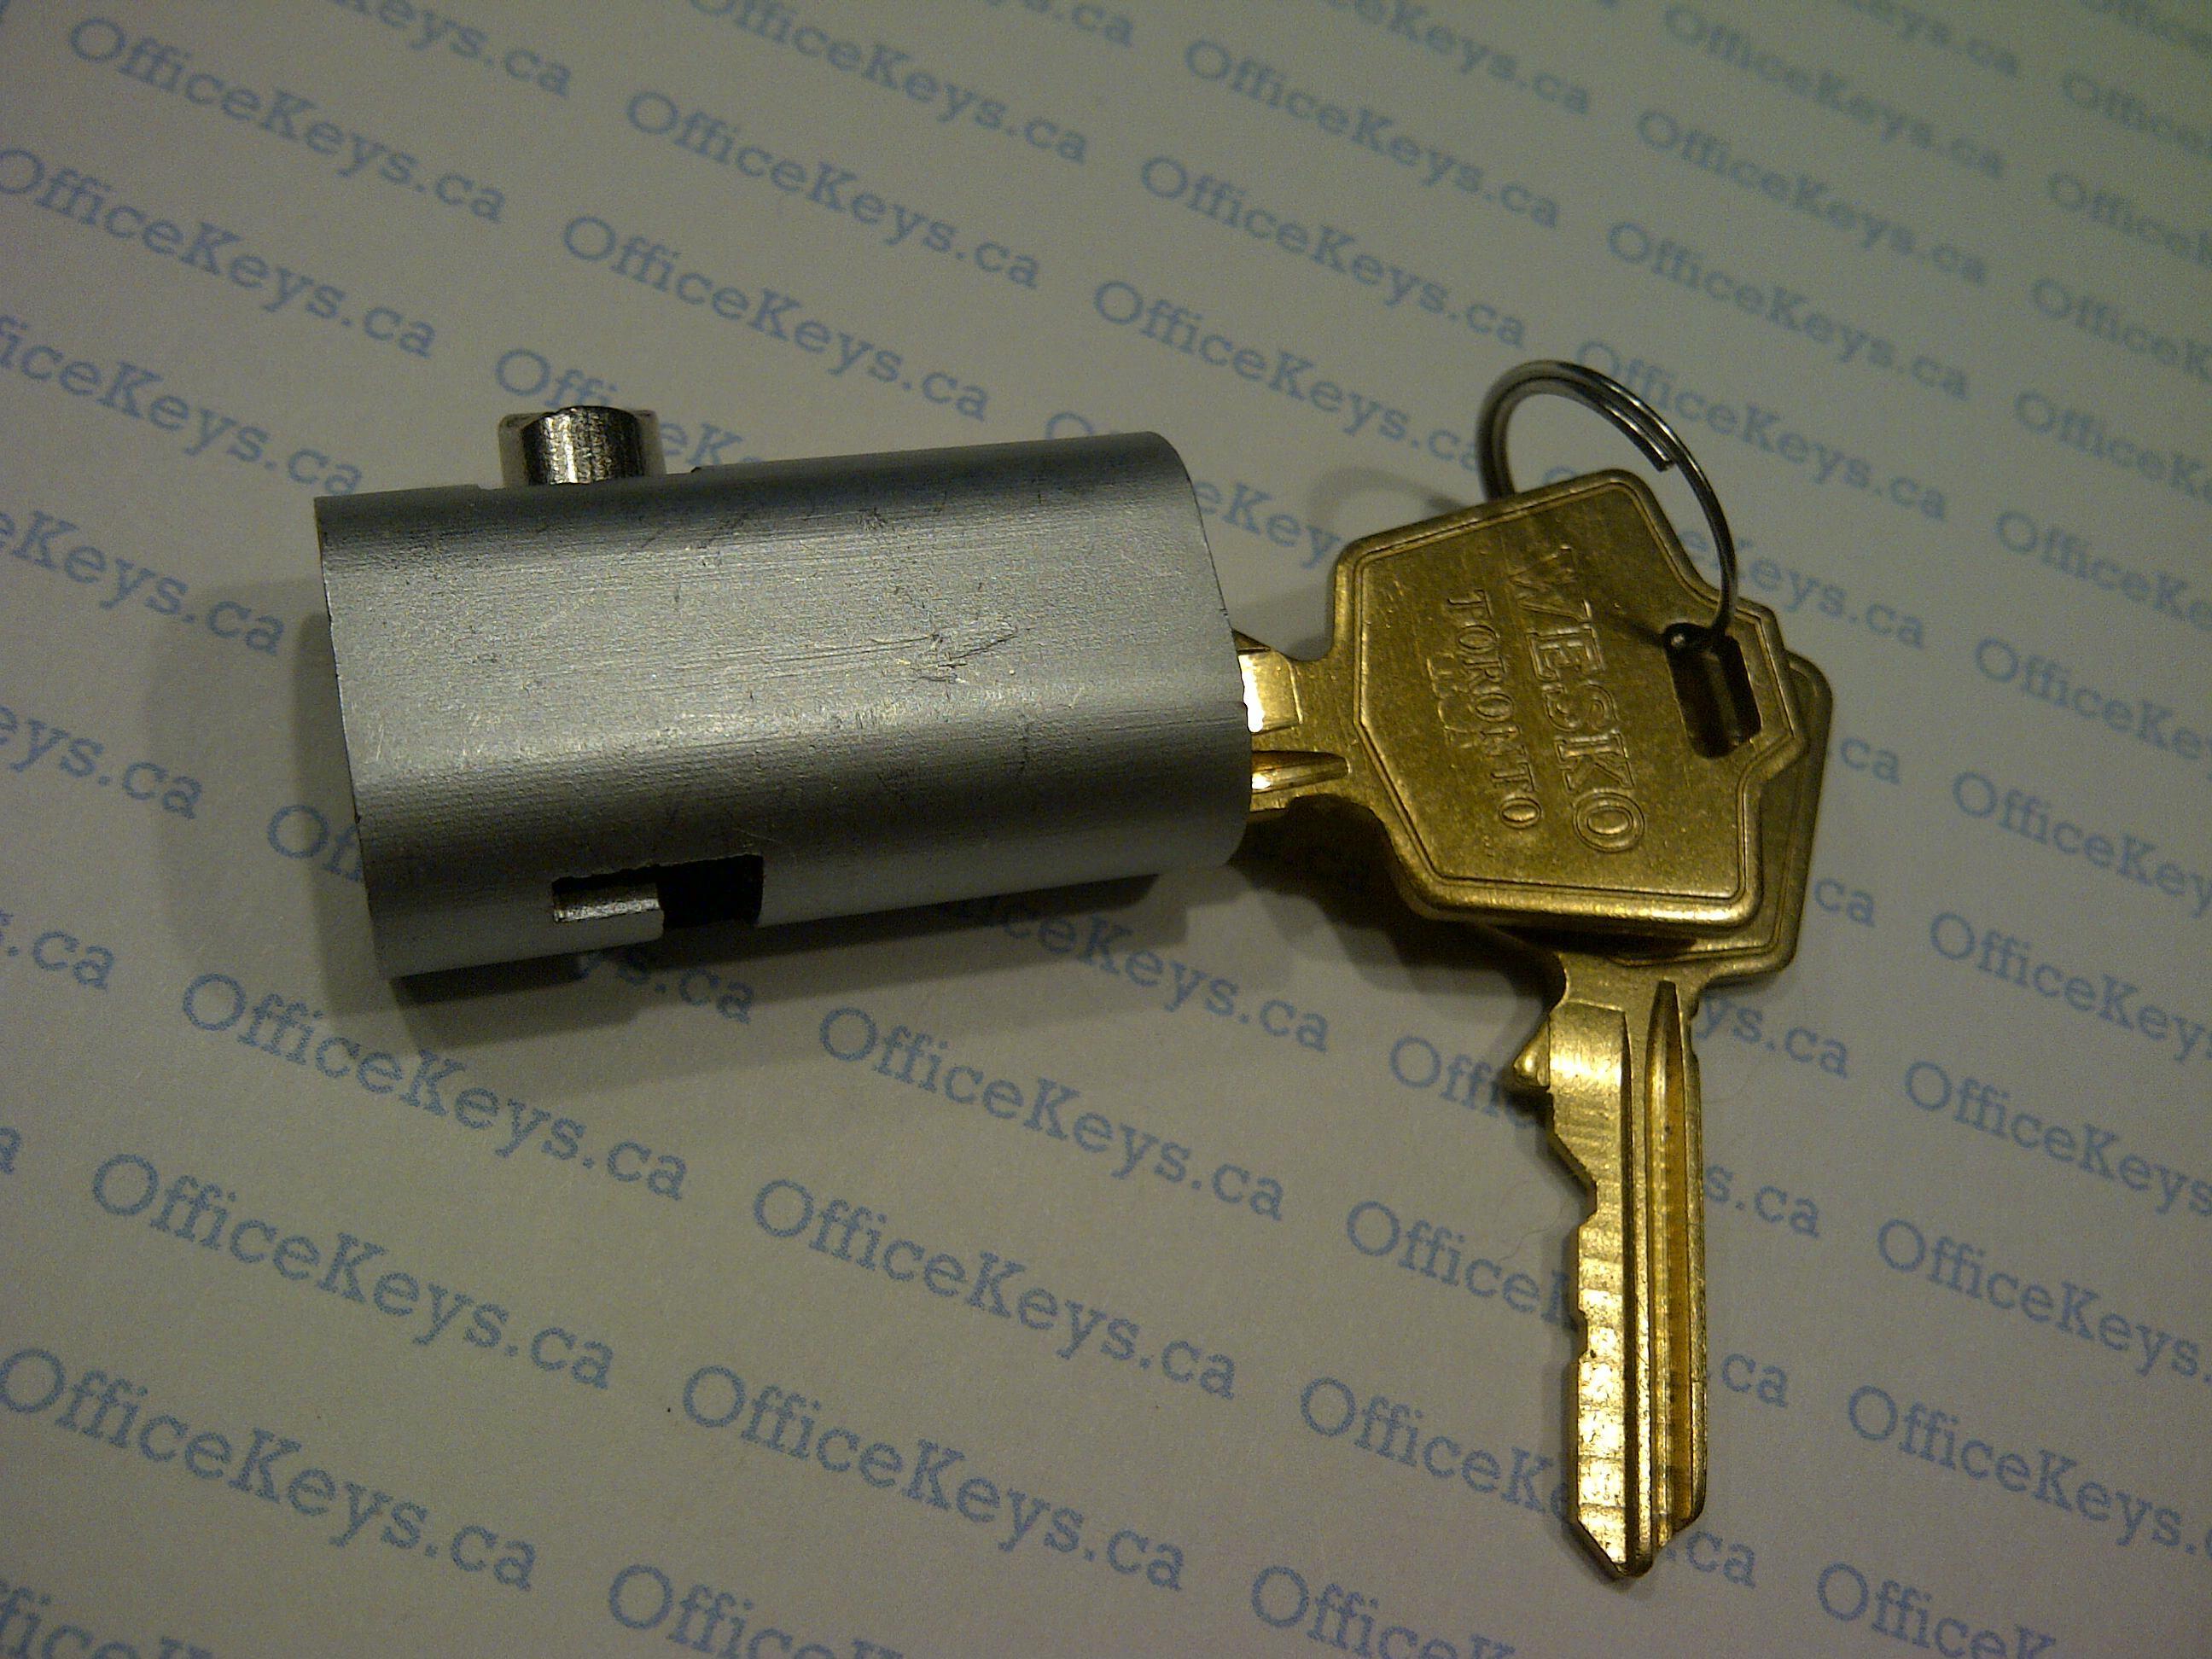 Gardex and Schwab Fireproof File Lock | OfficeKeys.ca